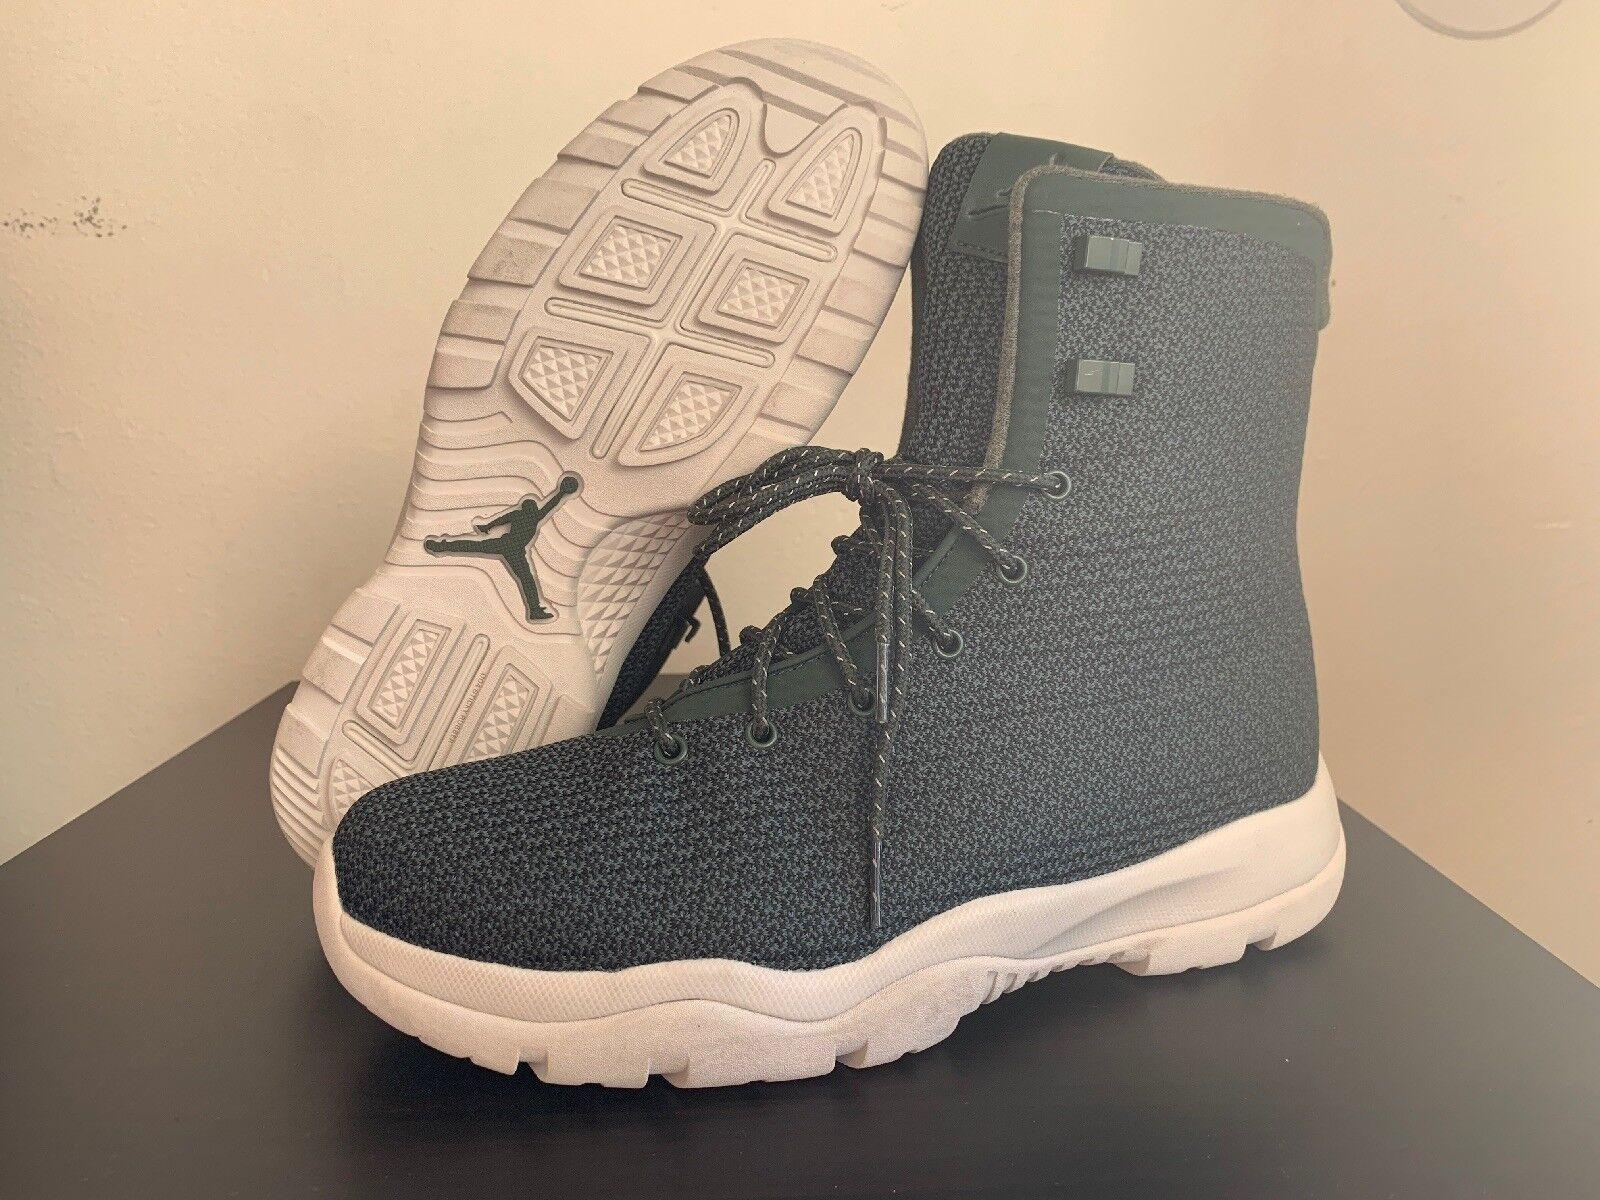 Air Jordan Future Stiefel 854554-300 Grove Grün Men Größe 10.5 10.5 10.5 MSRP  225 e9e6e3